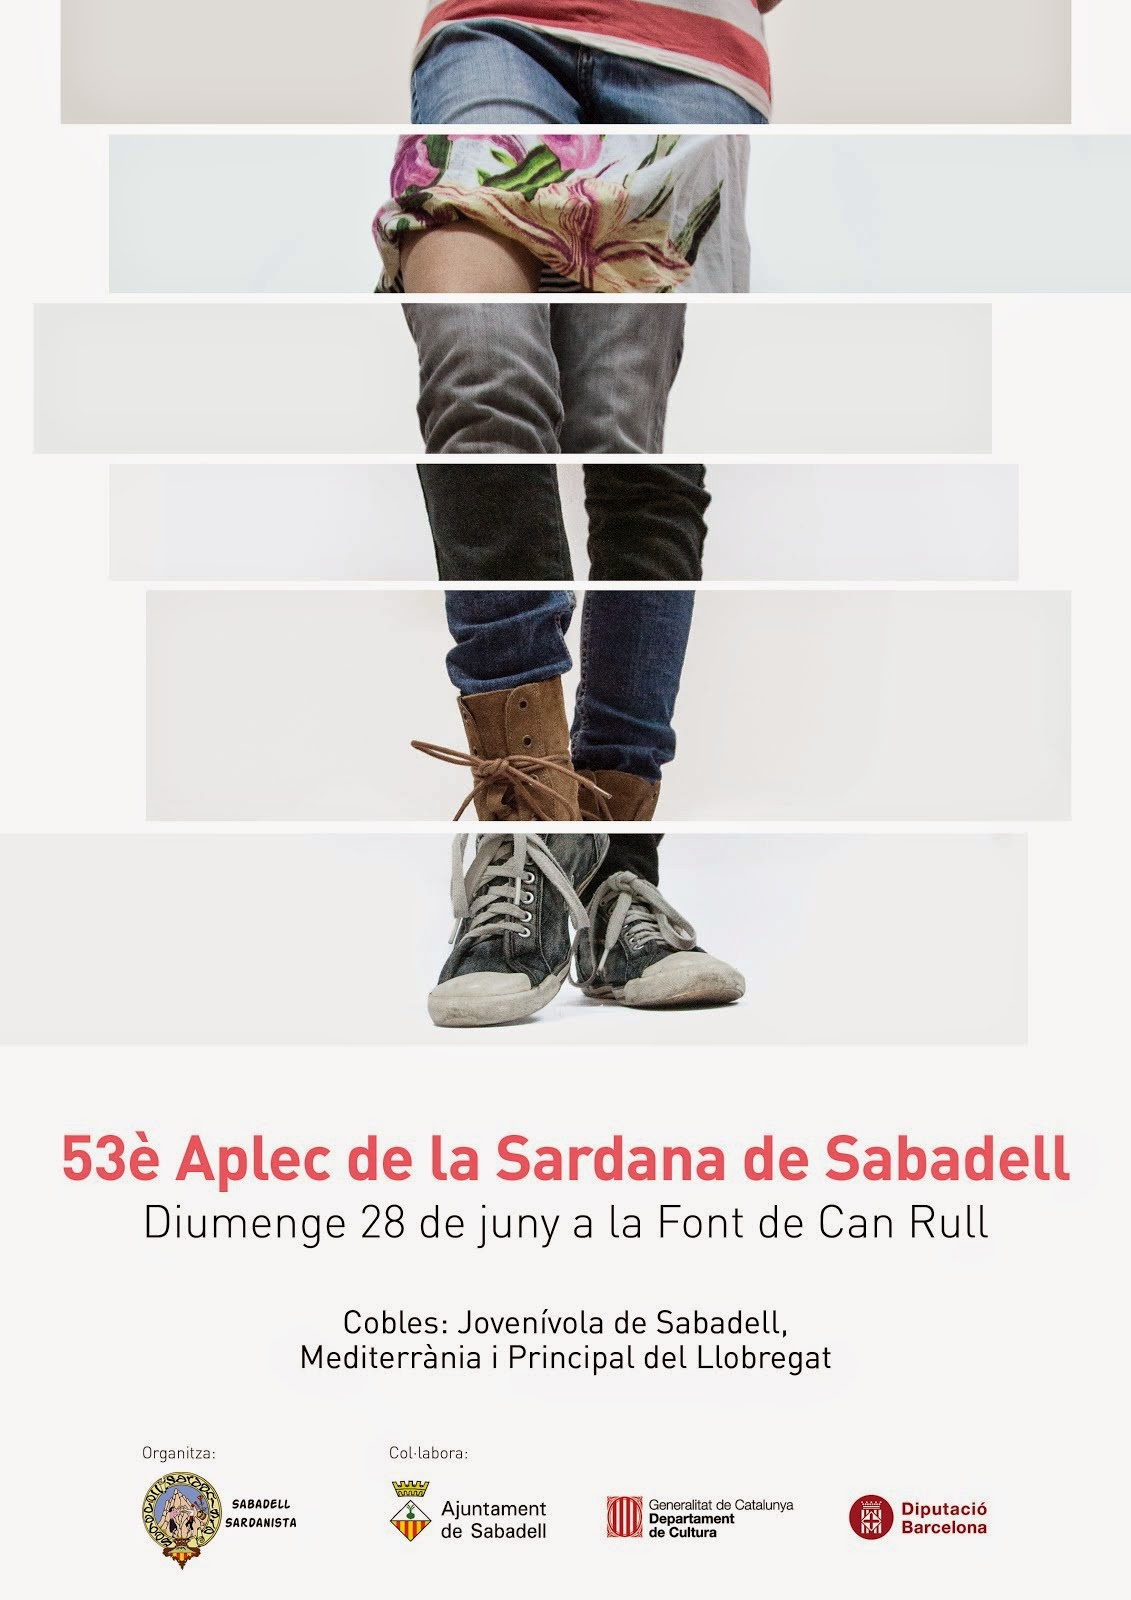 53è Aplec de la Sardana de Sabadell